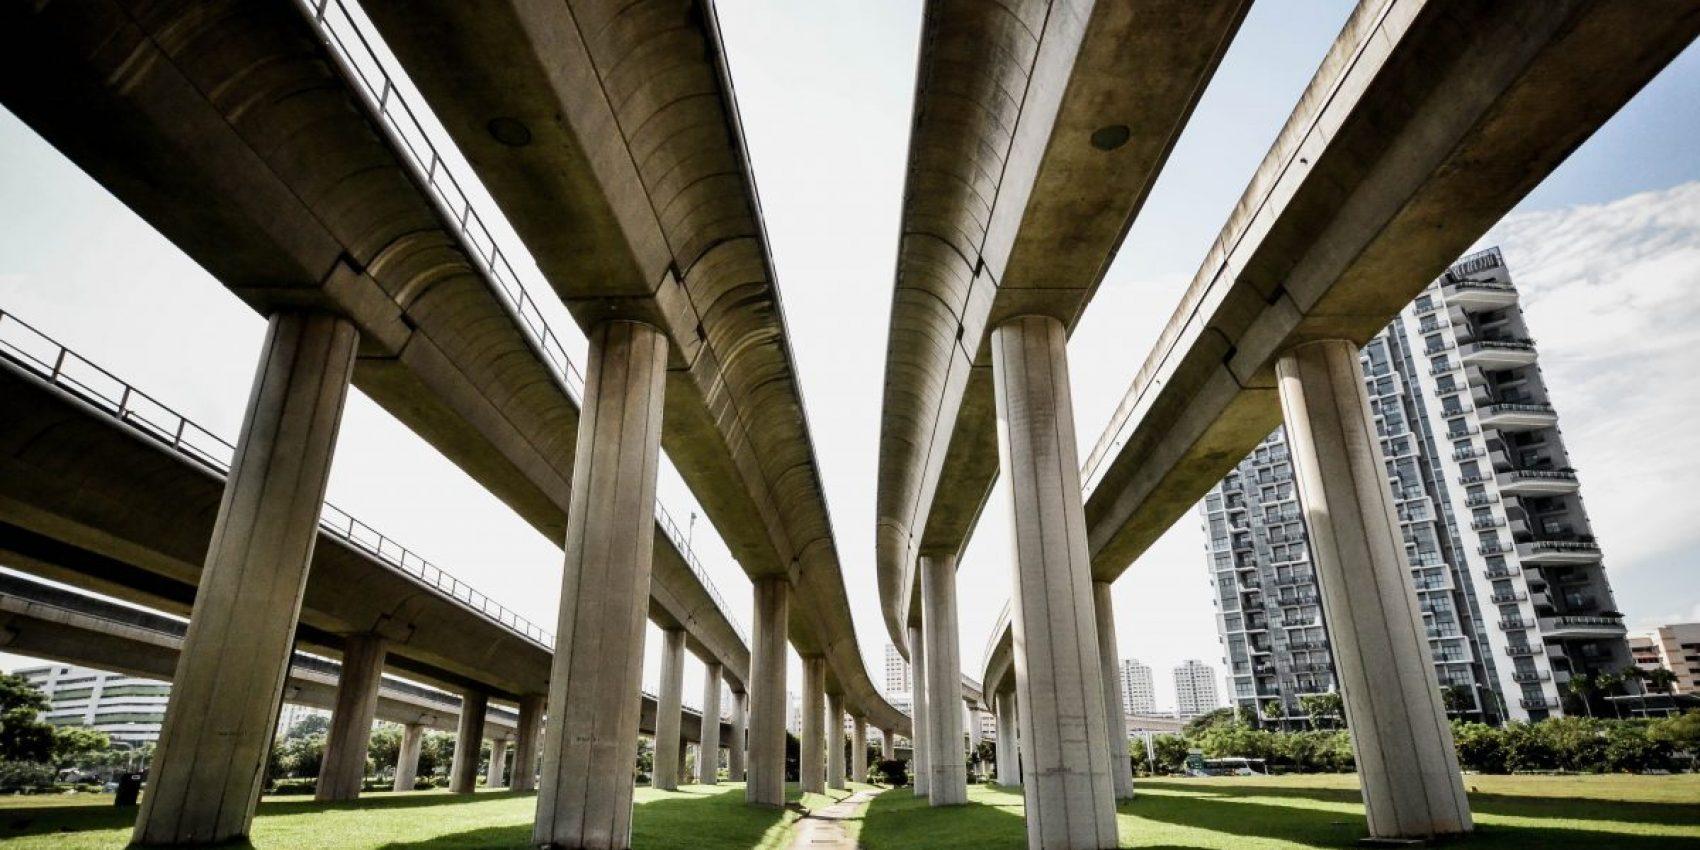 esaias-tan-Singapore-e1531824934831